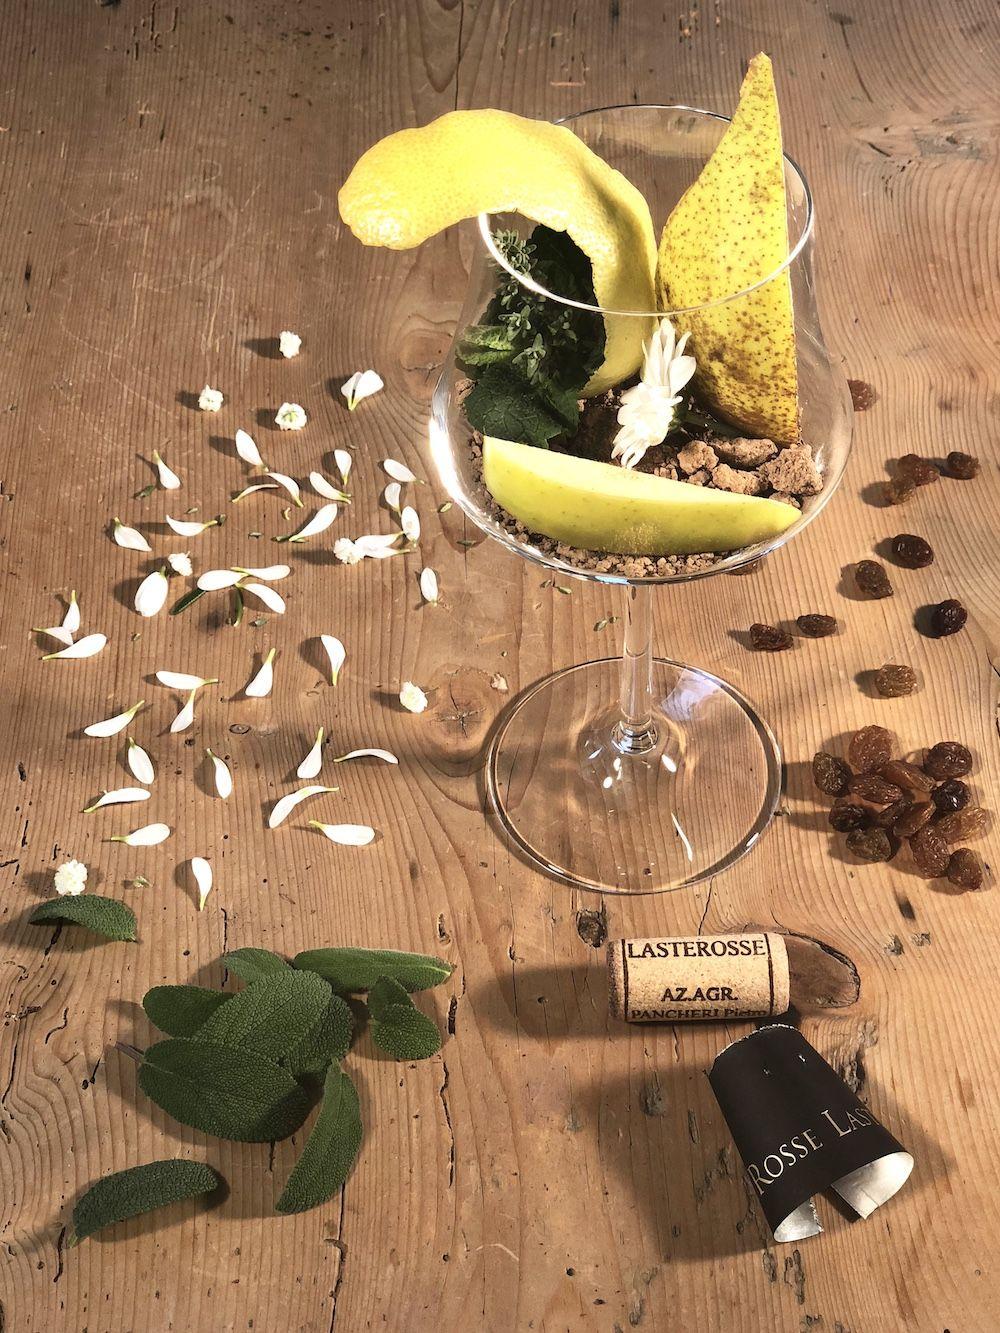 degustazione-gewurztraminer-cantina-lasterosse